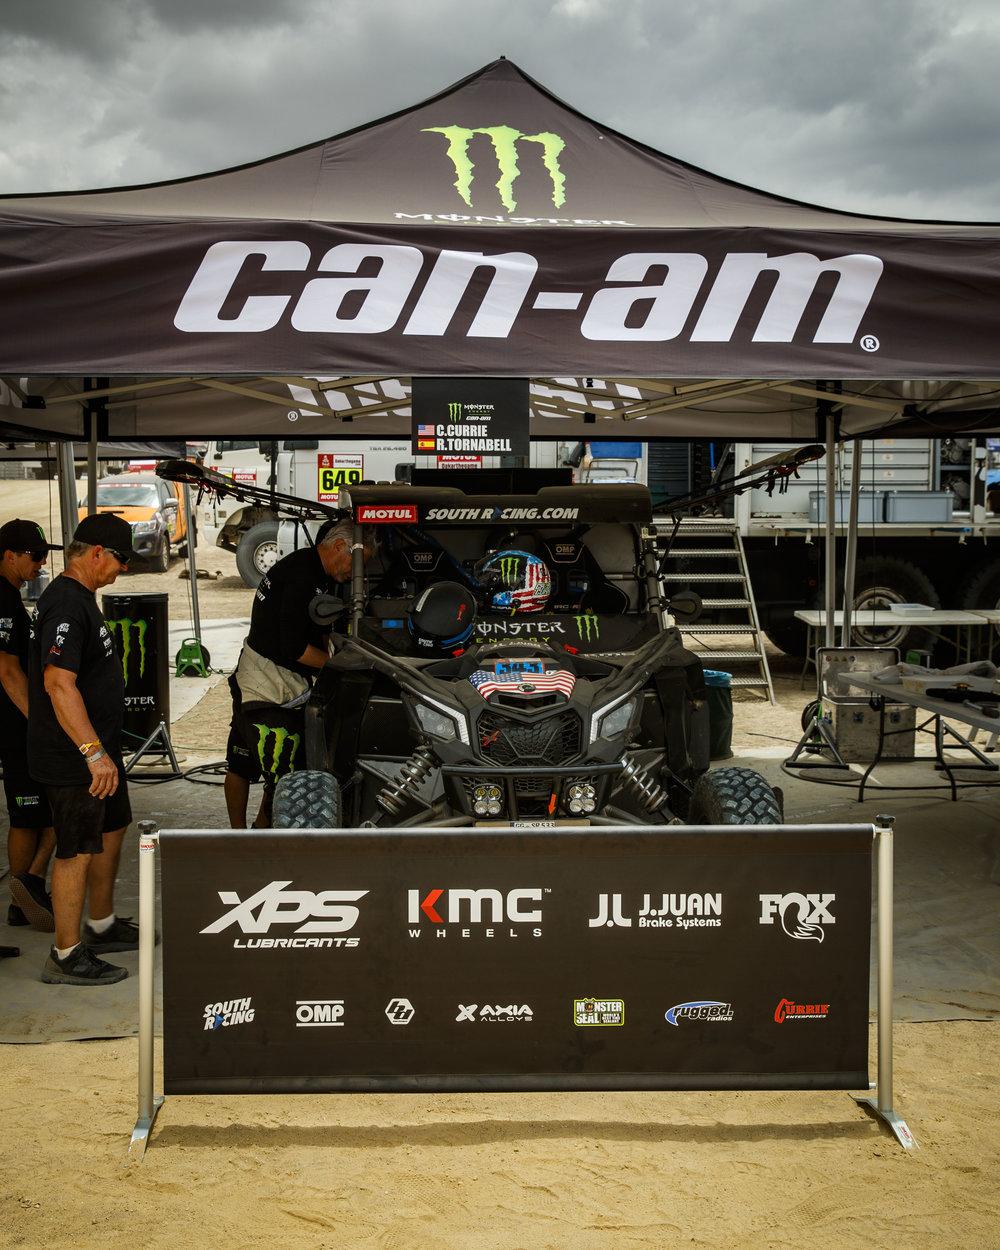 CaseyCurrie_Dakar_PiscoPeru_Stage1_CanAm_4X5_001.jpg